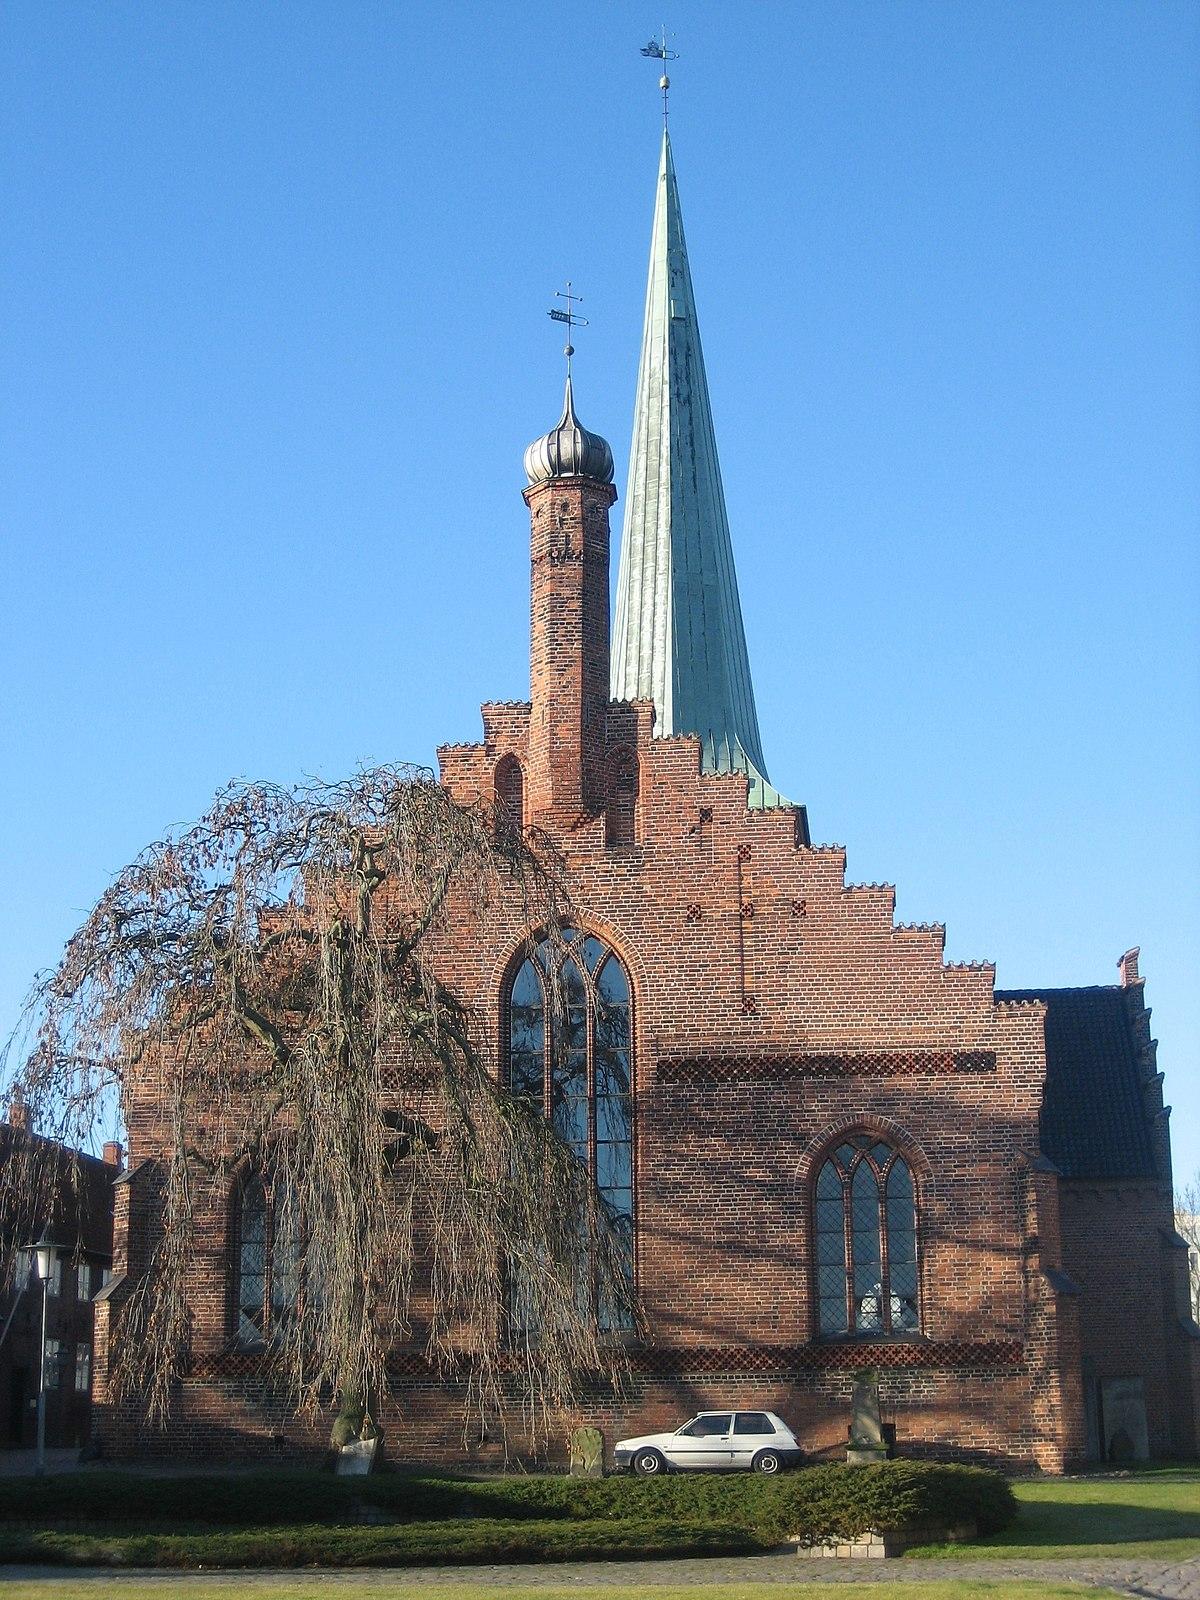 Nyborg – Travel guide at Wikivoyage